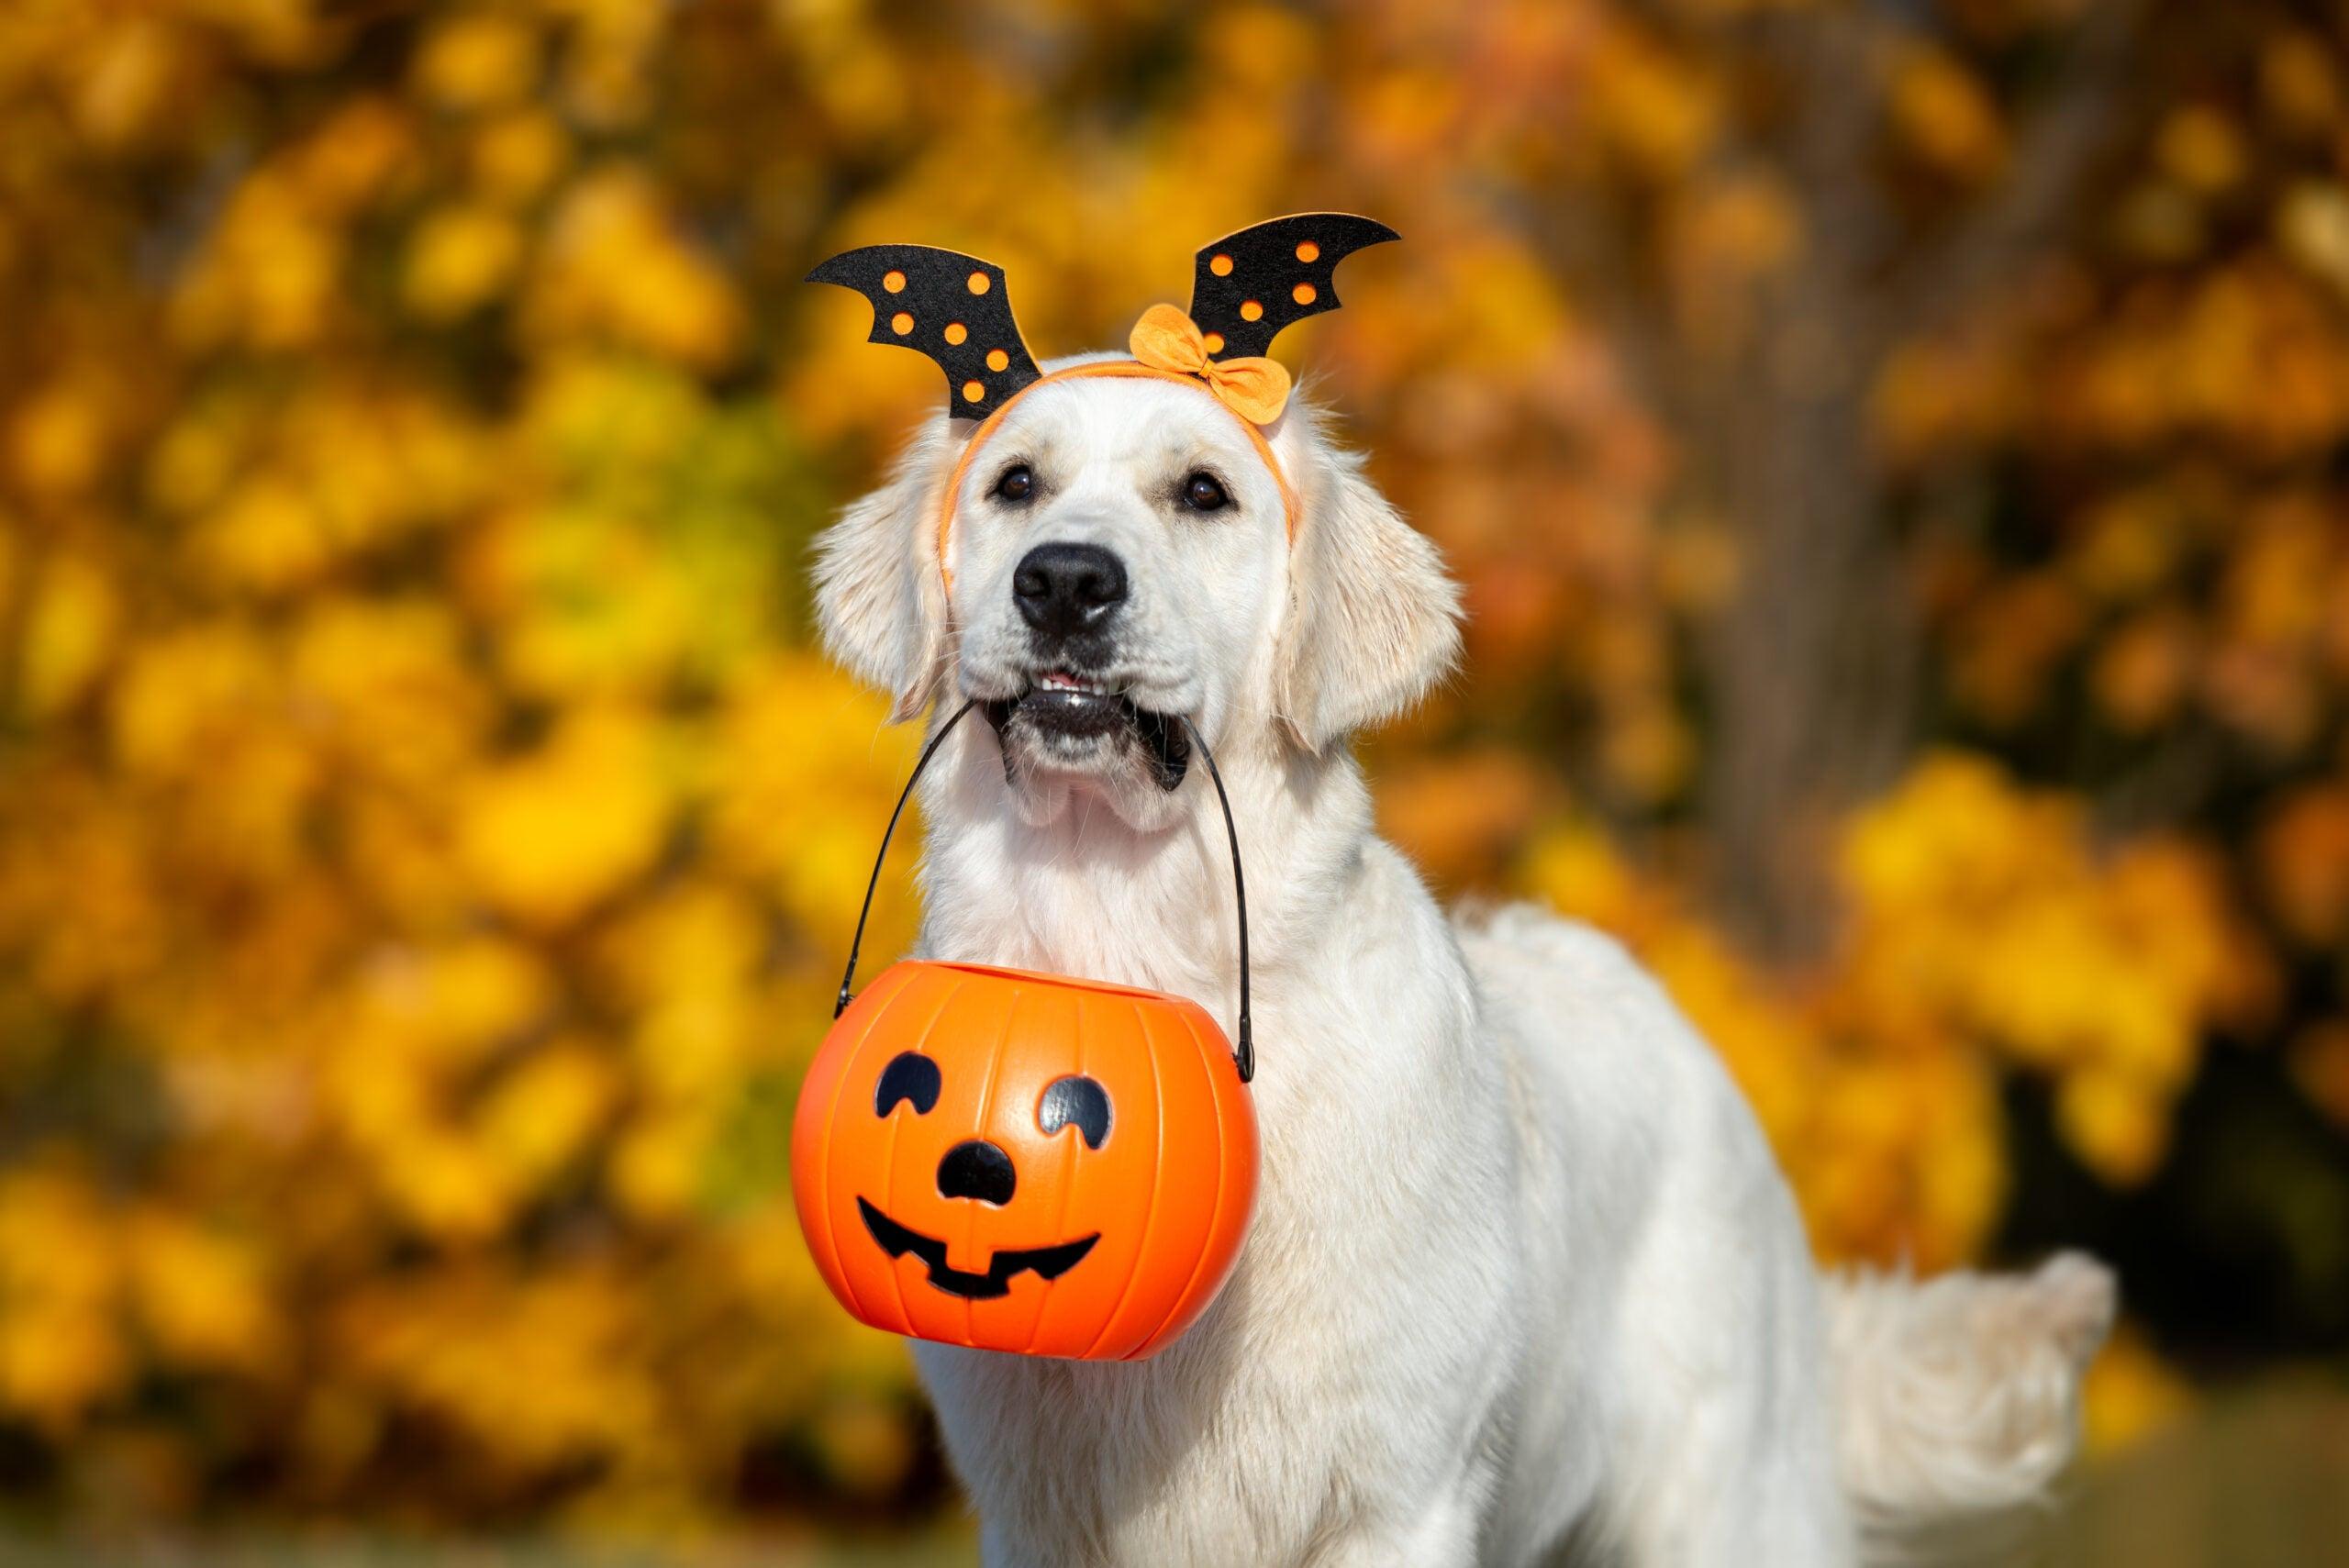 Golden Retriever wearing a Halloween headband ready to trick or treat.